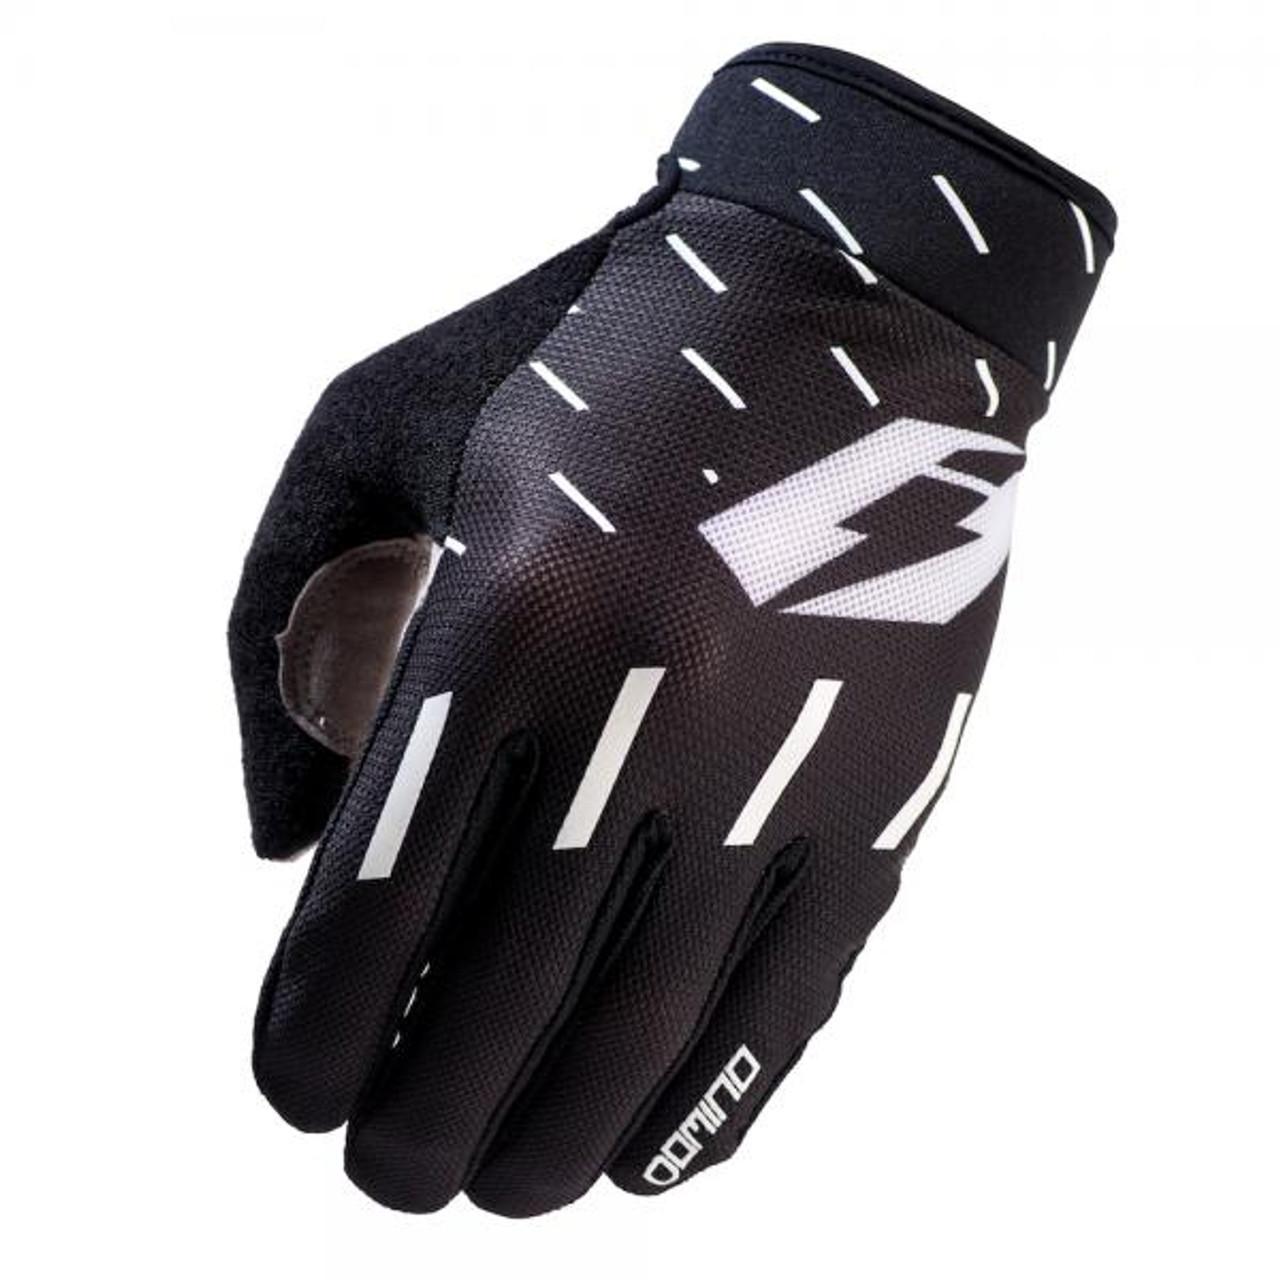 Gloves Domino, black/ white